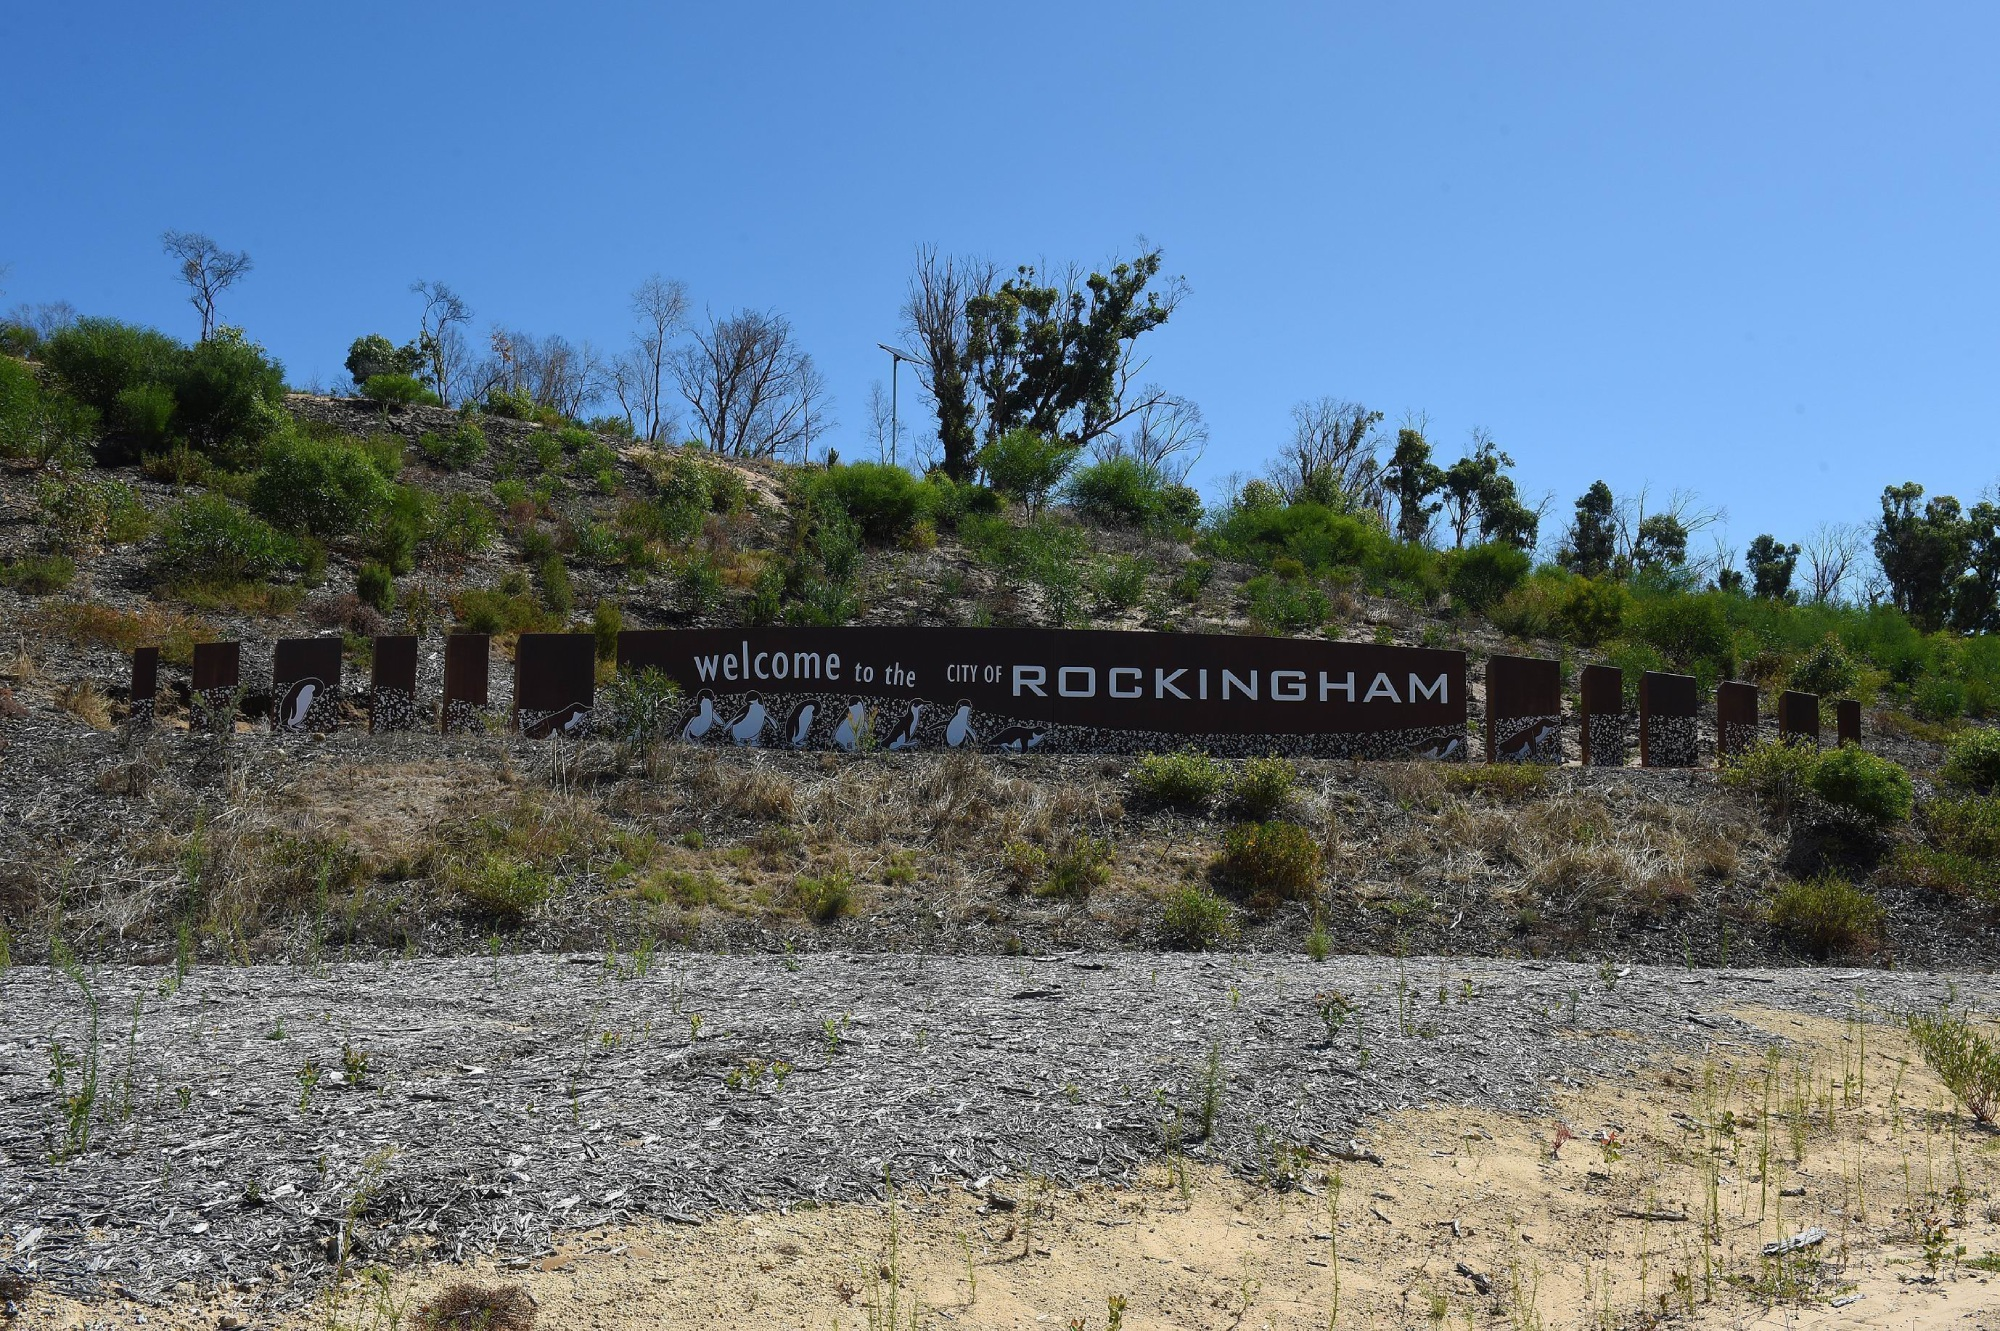 Sun shines on City of Rockingham's CCTV network